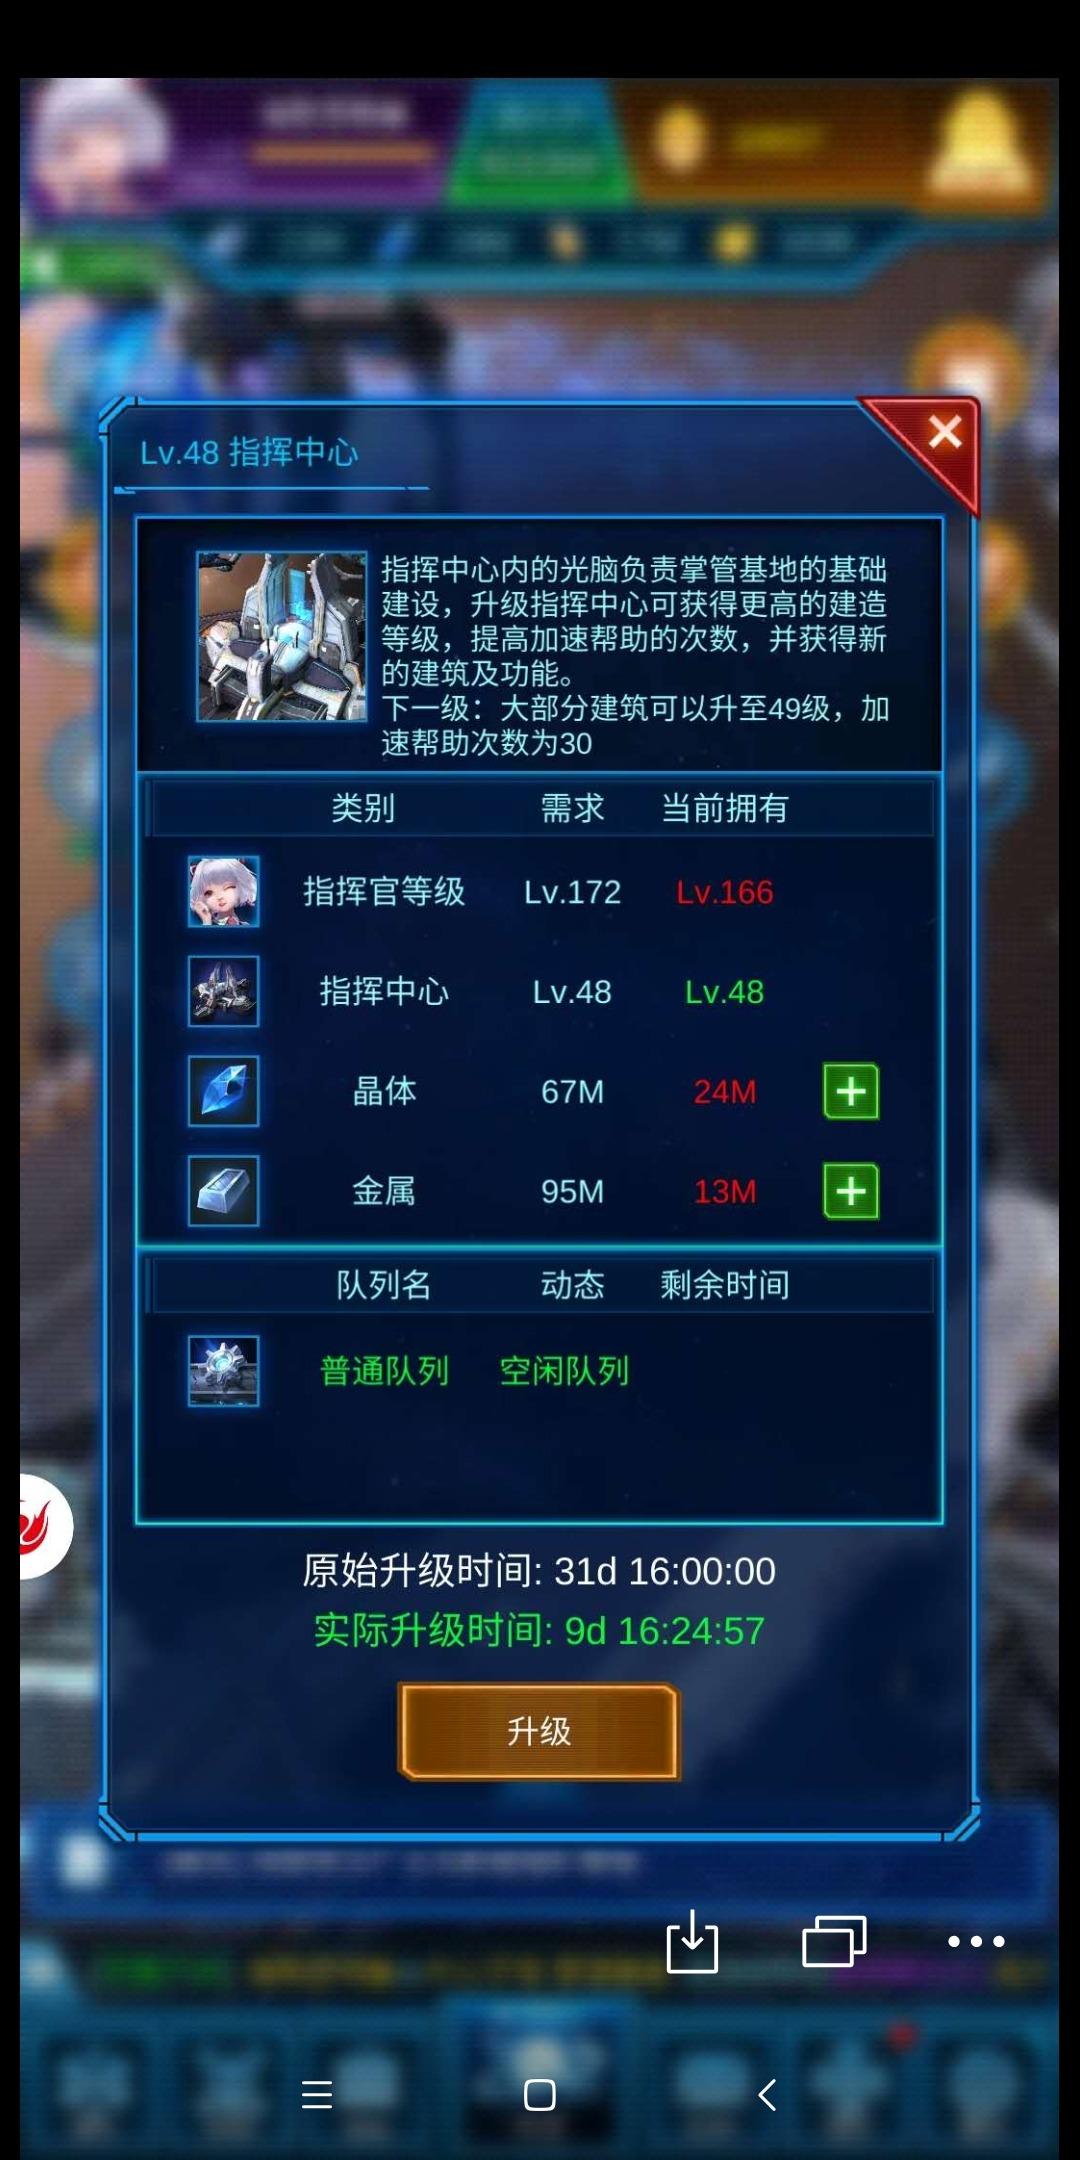 Screenshot_2020-03-09-18-04-09-872_com.tencent.mm.jpg